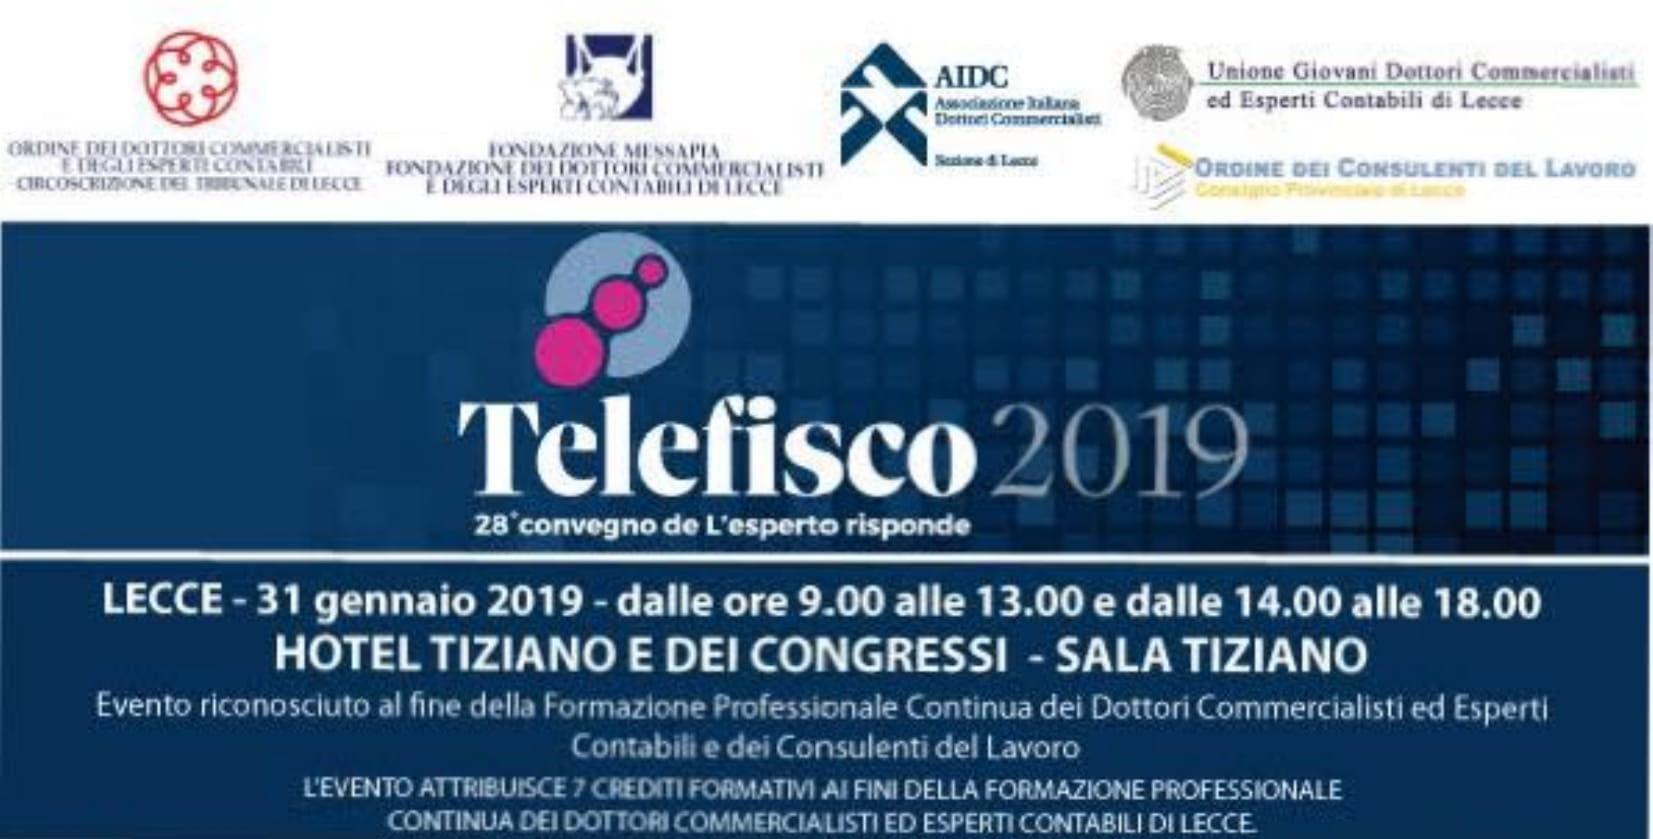 Federterziario a Telefisco 2019